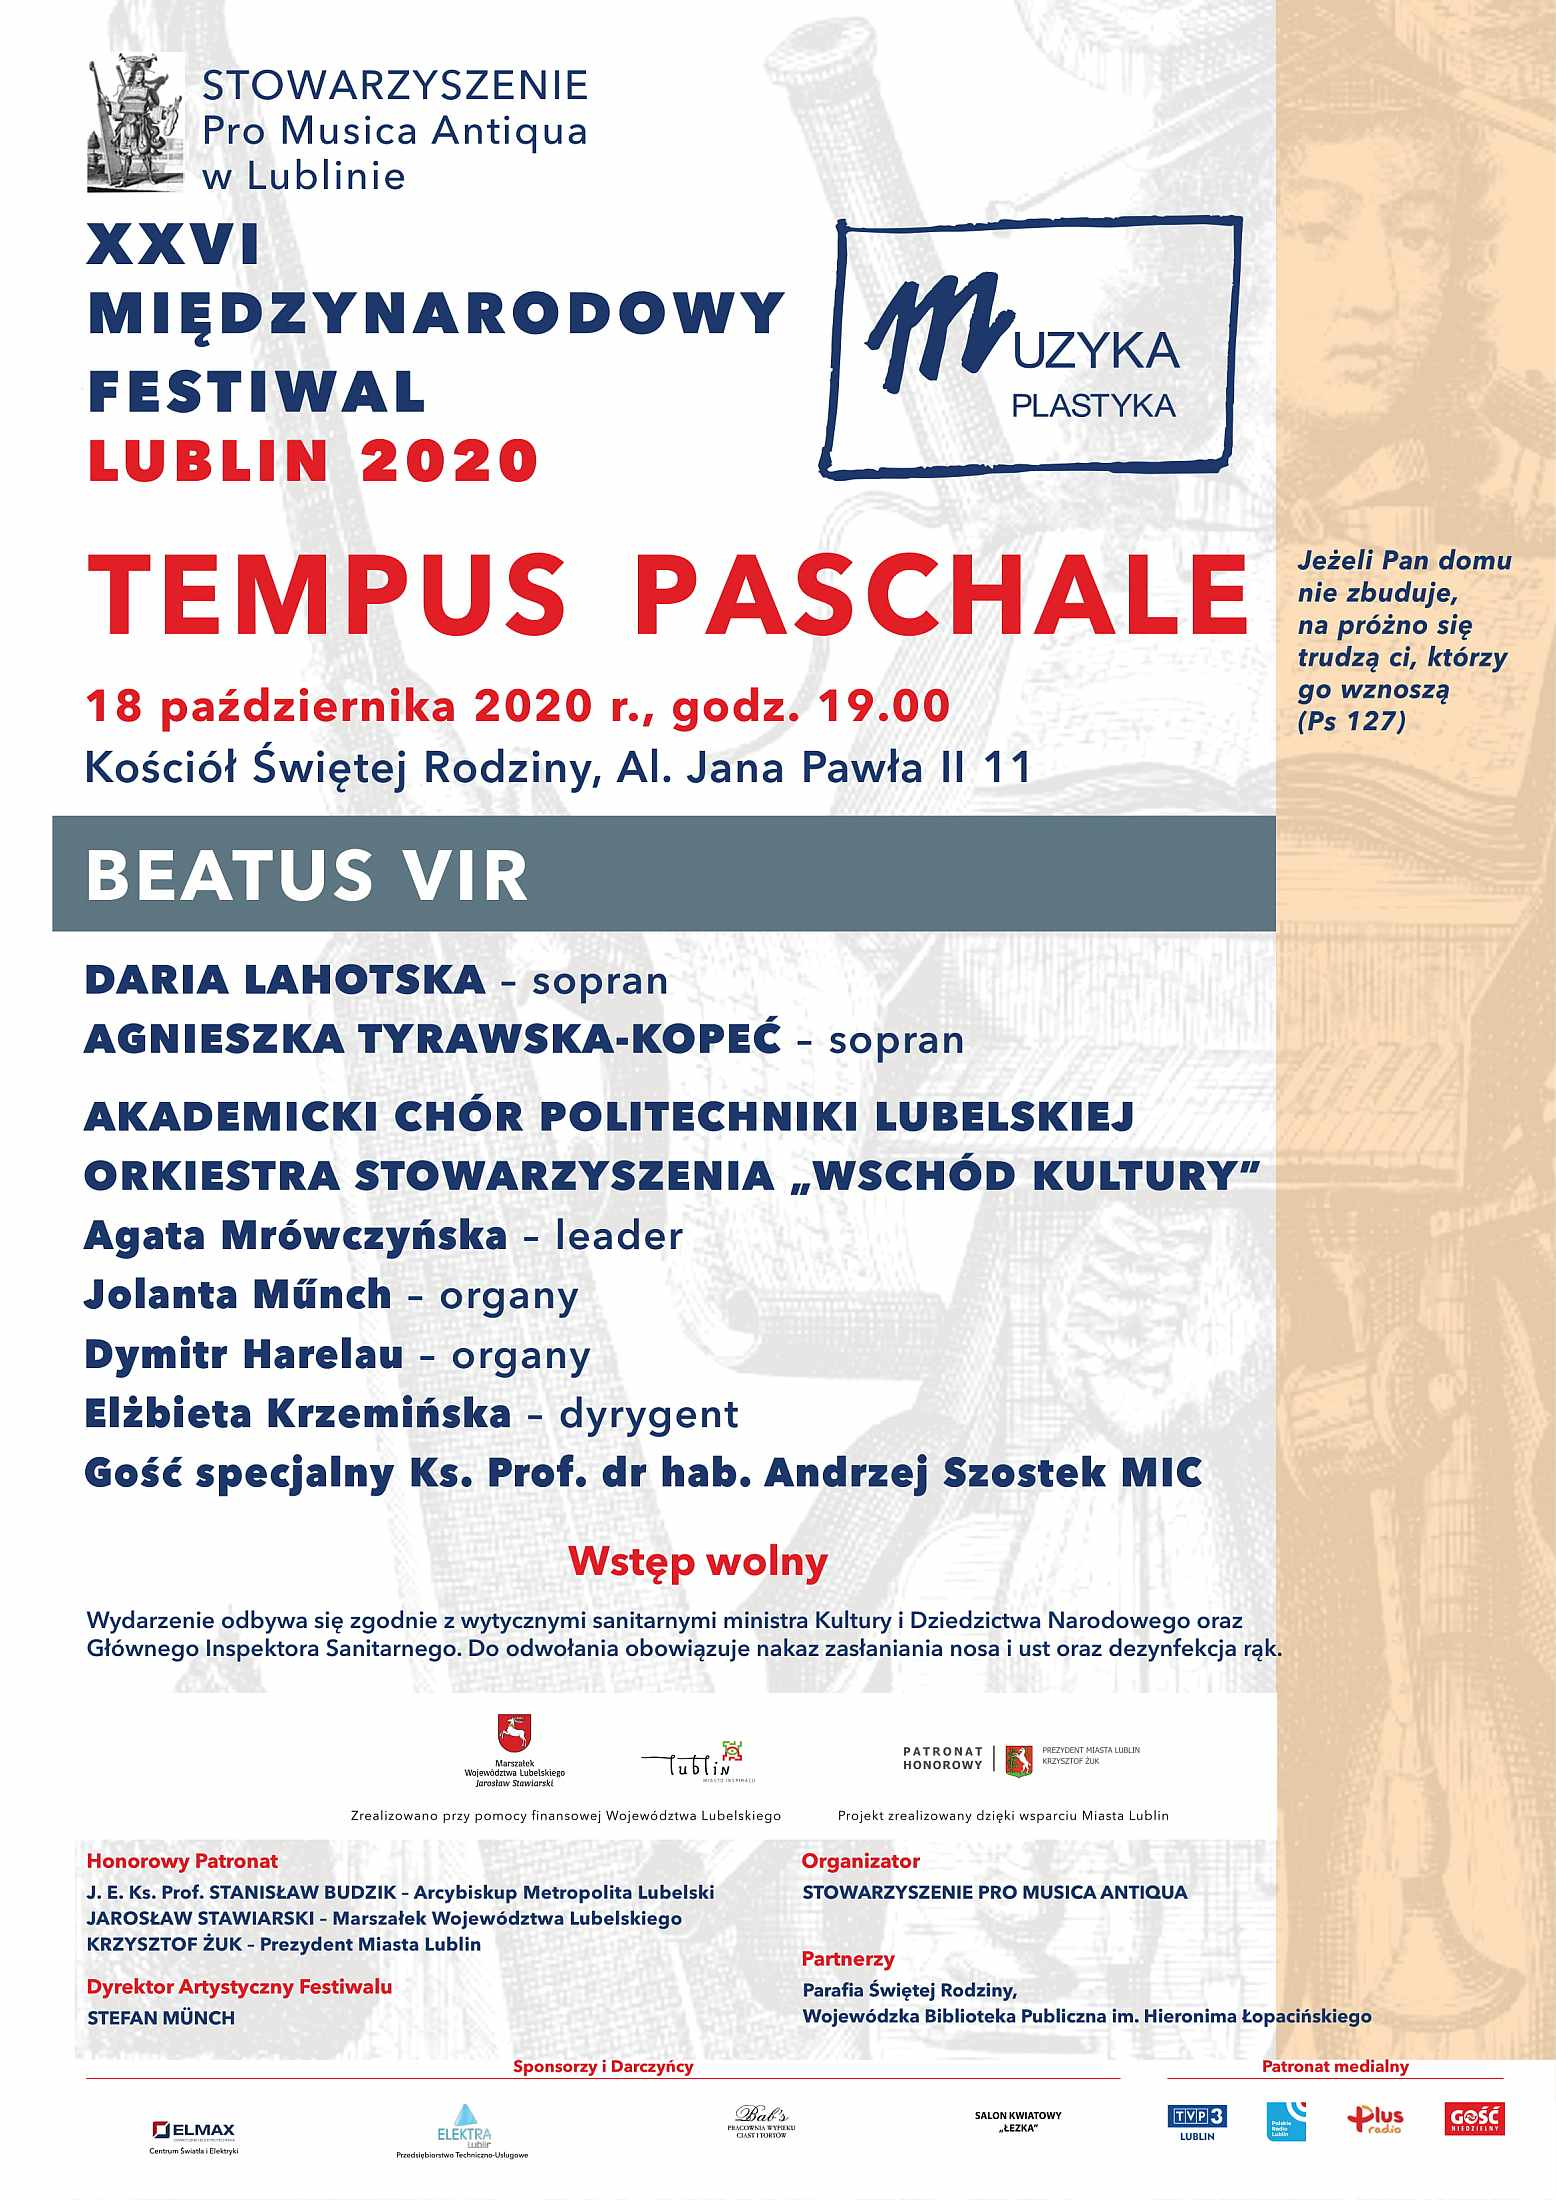 Koncert Tempus Paschale - Beatus Vir - 18.10.2020 r.